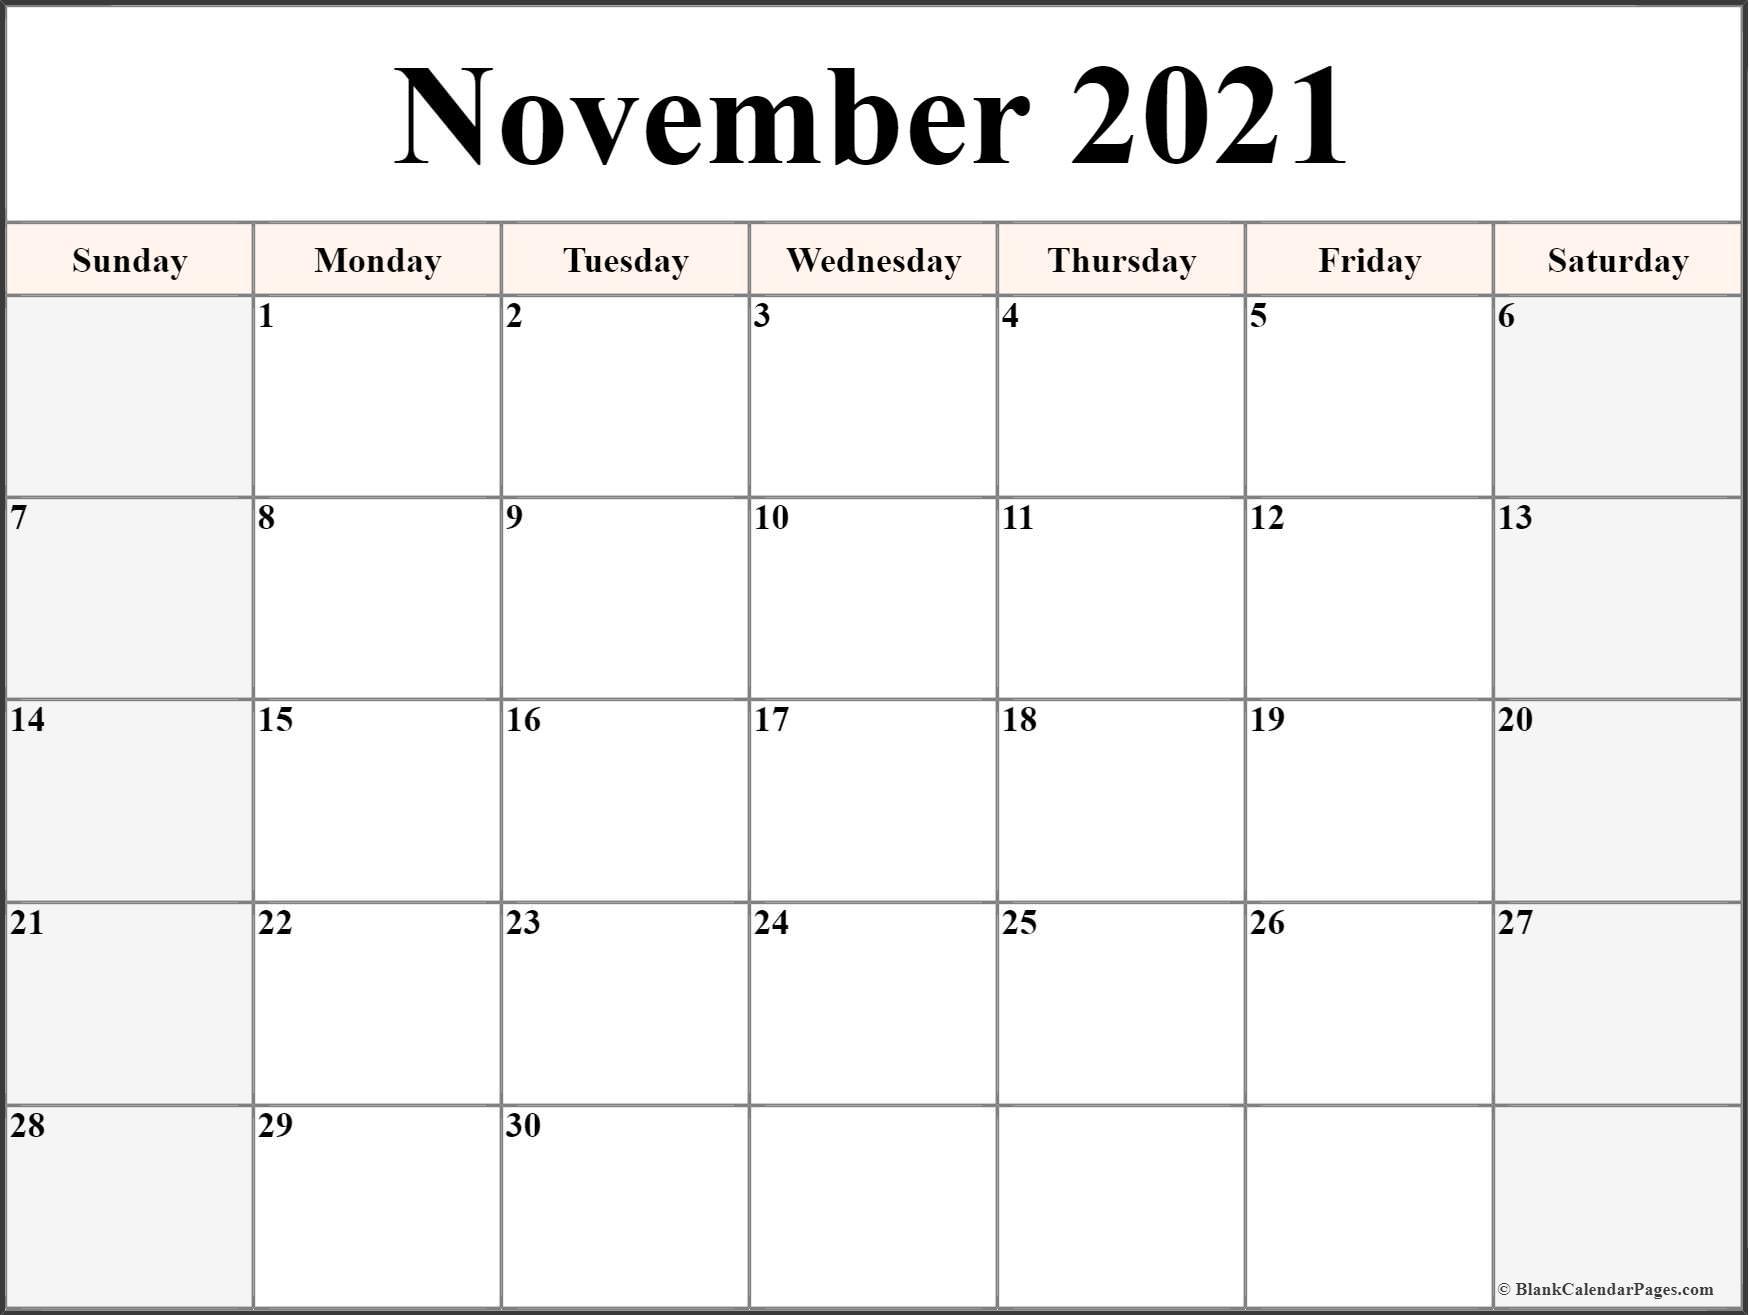 November 2021 Calendar   Free Printable Monthly Calendars Inside Calendar With November 2021 Mexican Names